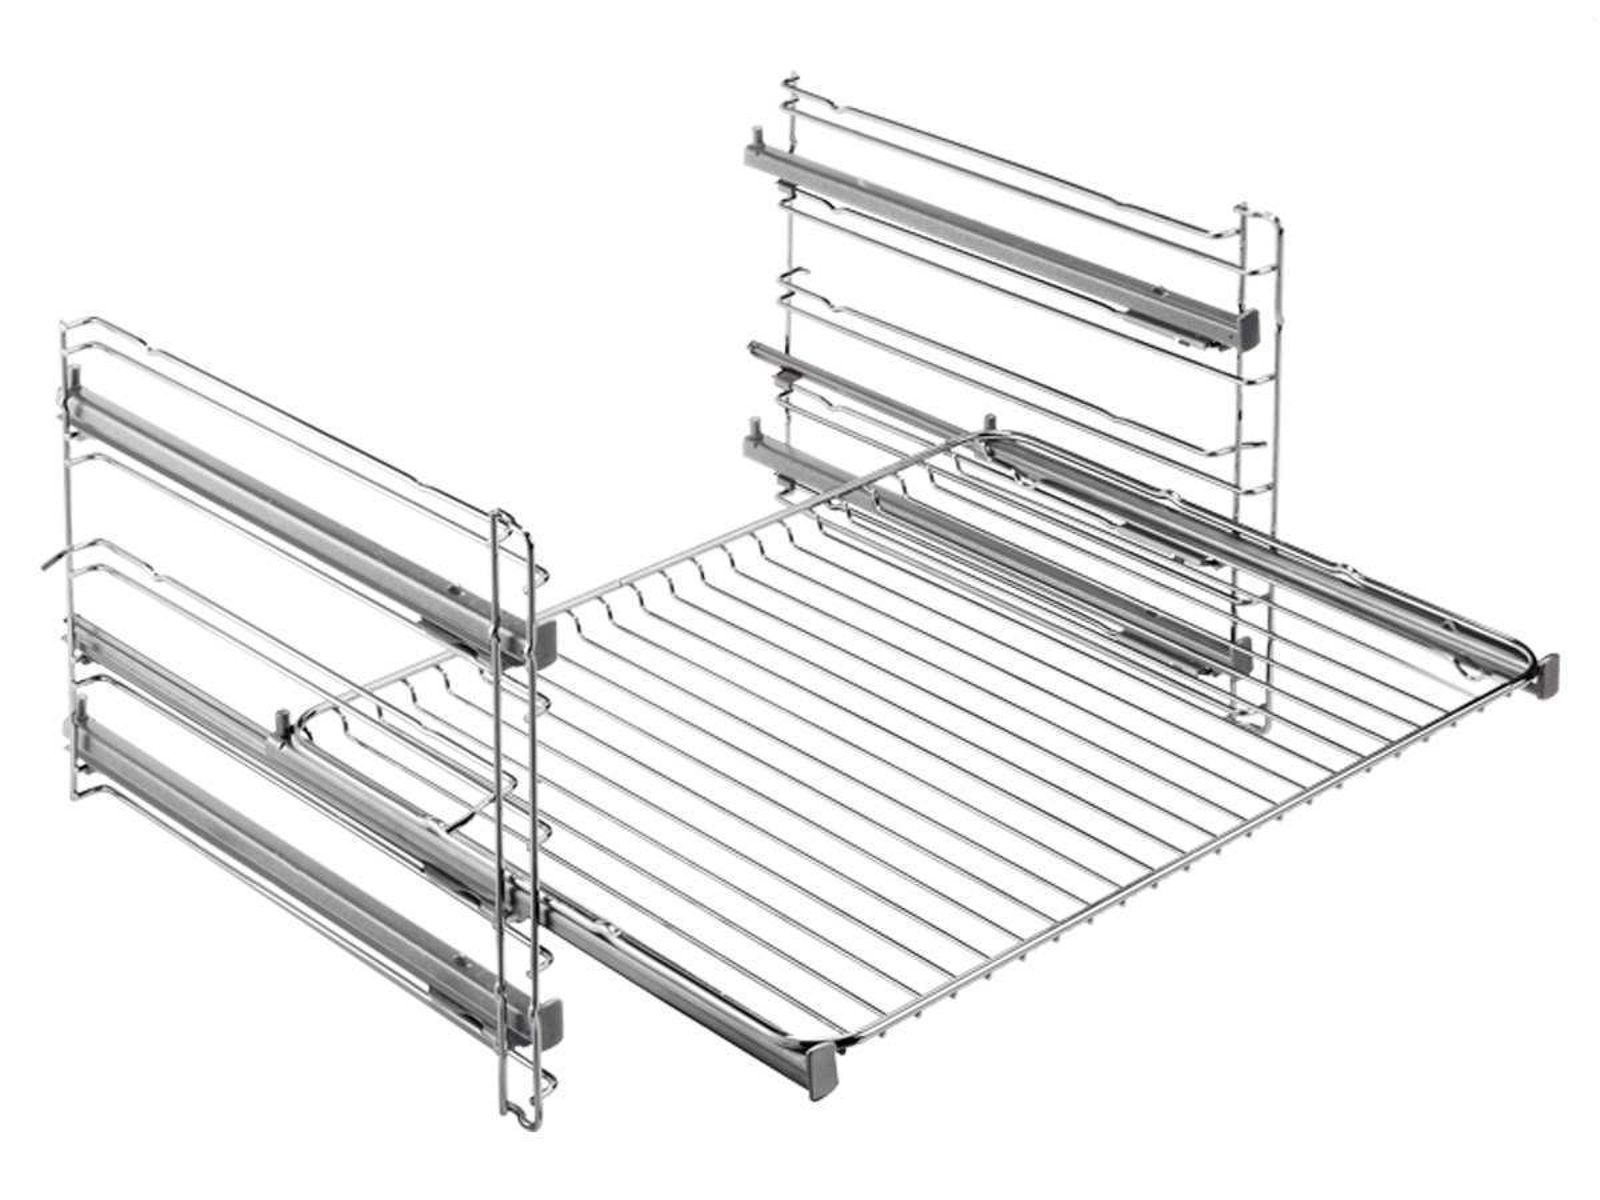 aeg tr3lv flexirunners backauszug 3 paar. Black Bedroom Furniture Sets. Home Design Ideas